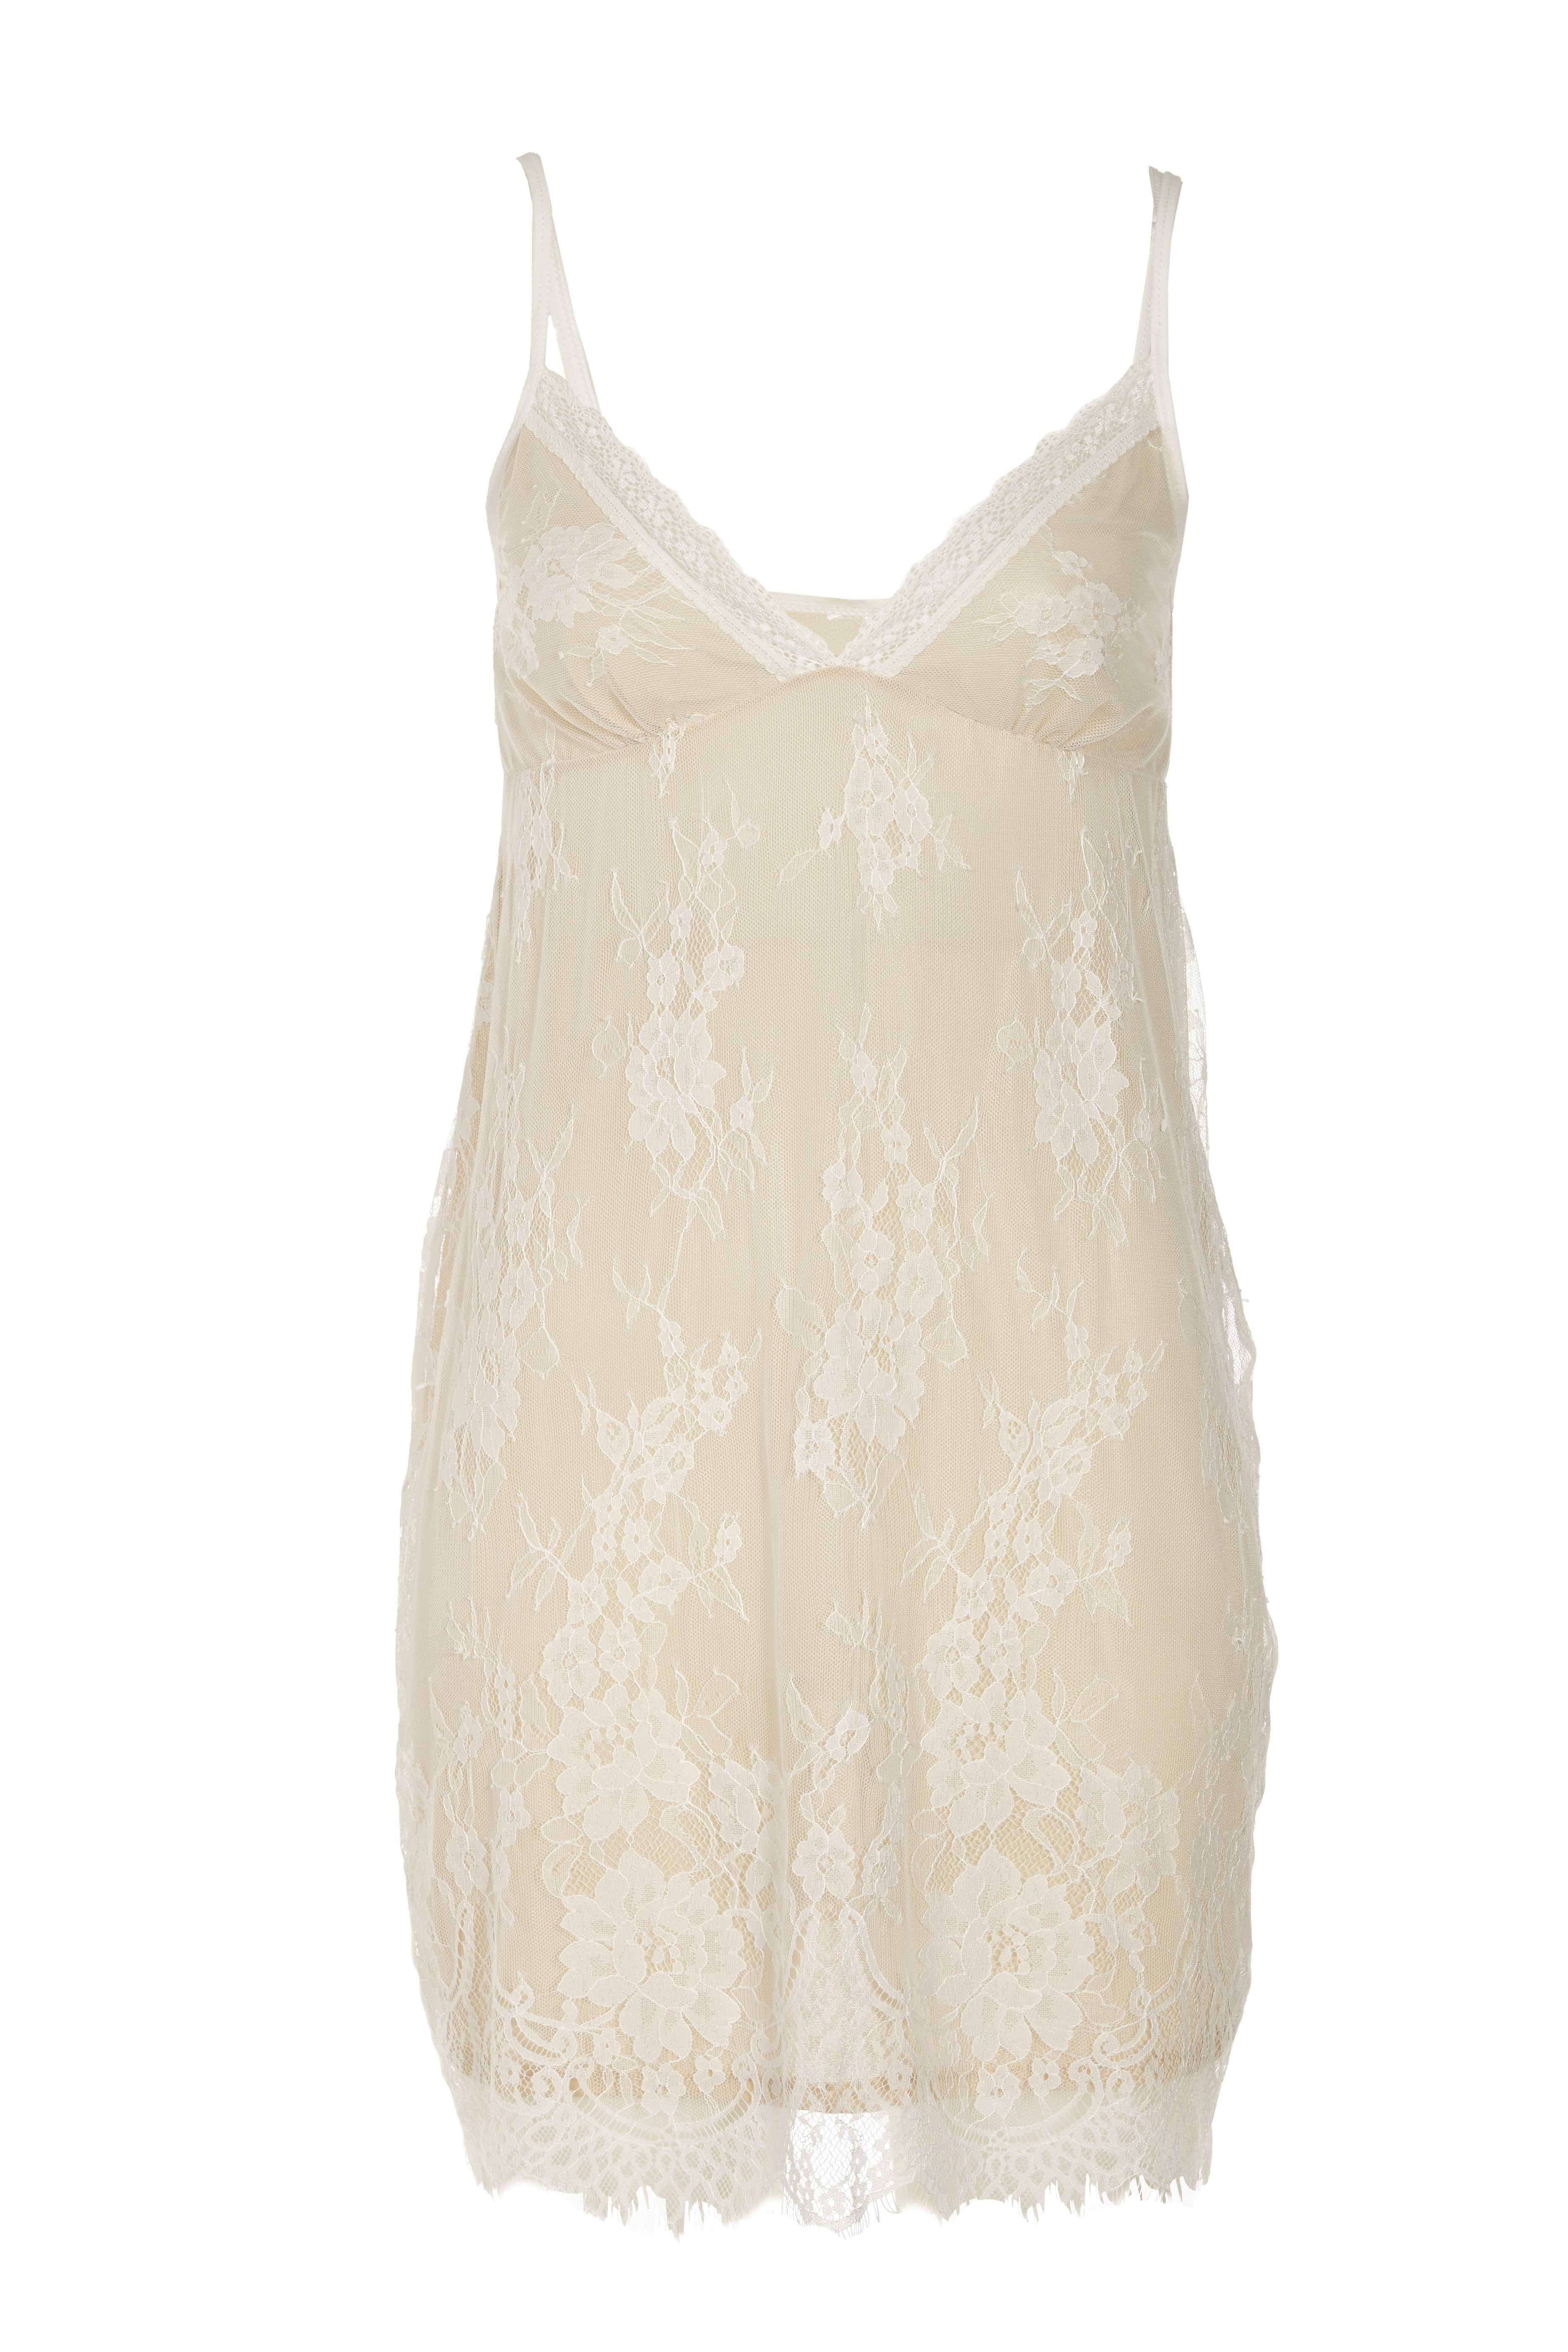 cotton-on-body_bridal_lace-slinky_nz34-95_oct-nov-dec